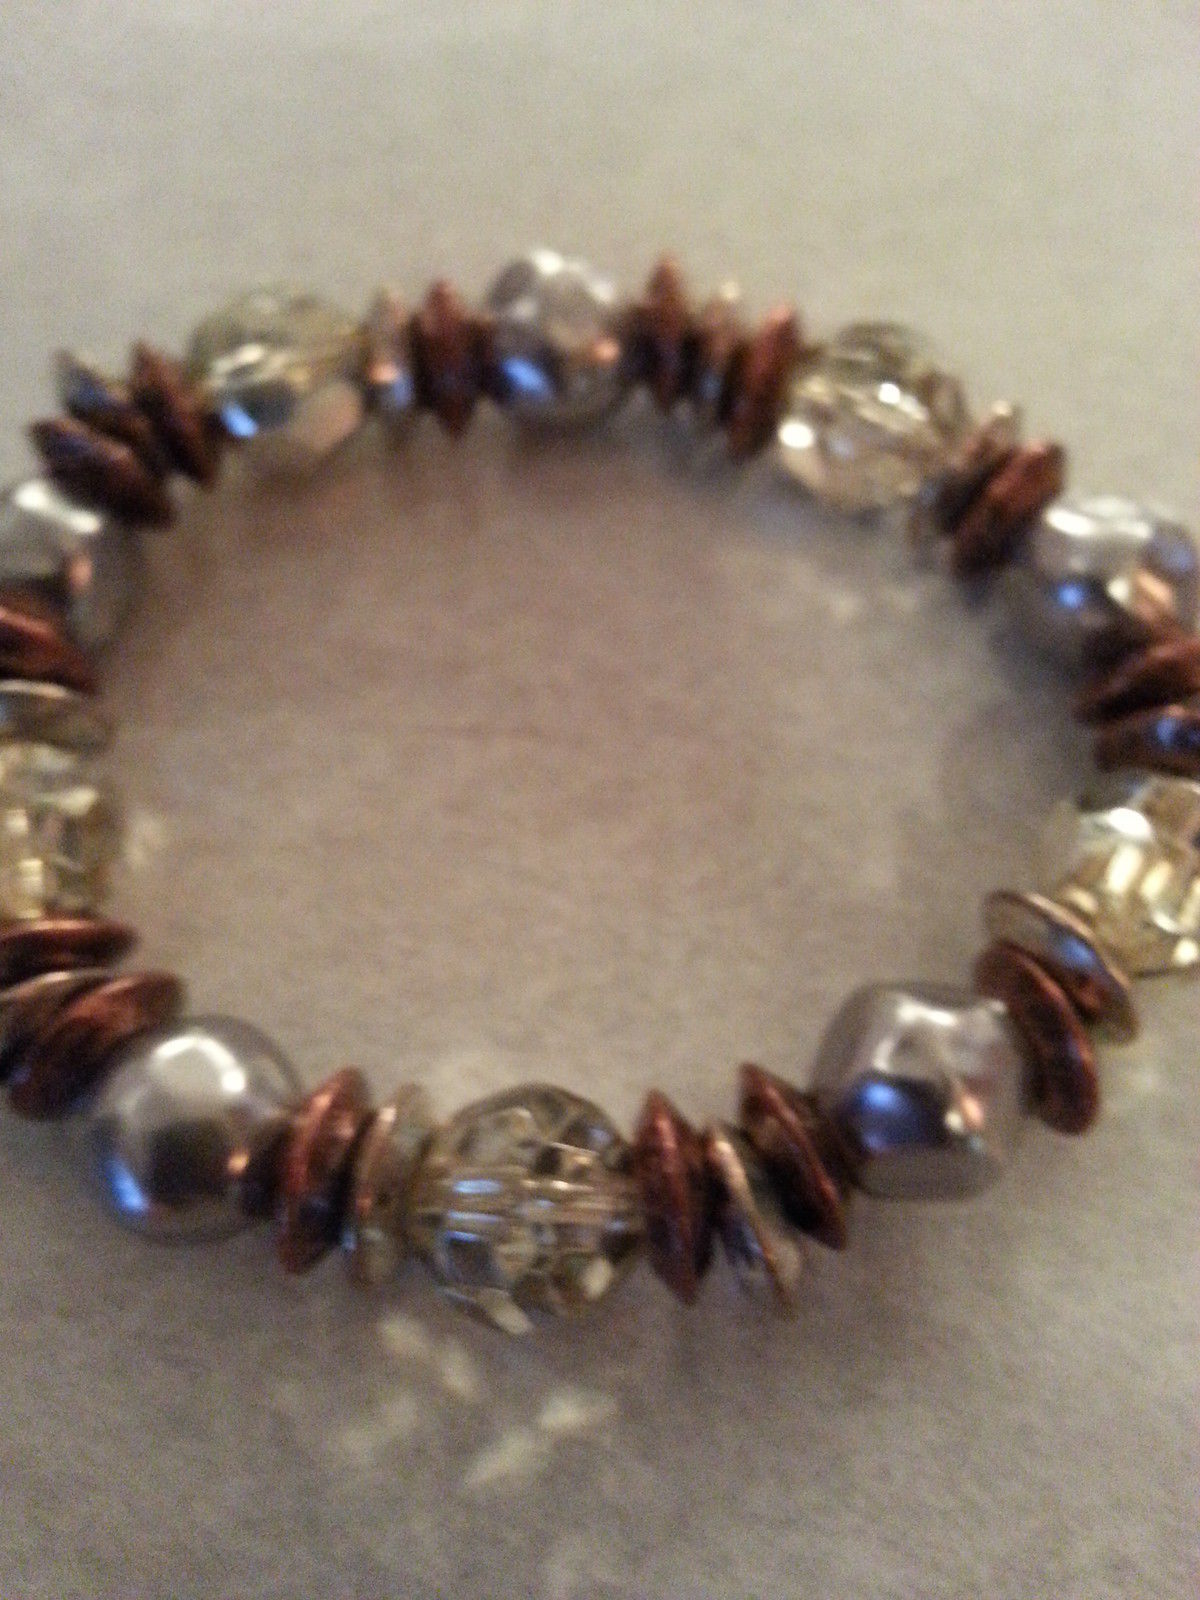 Bracelet. stretch style with glass beading